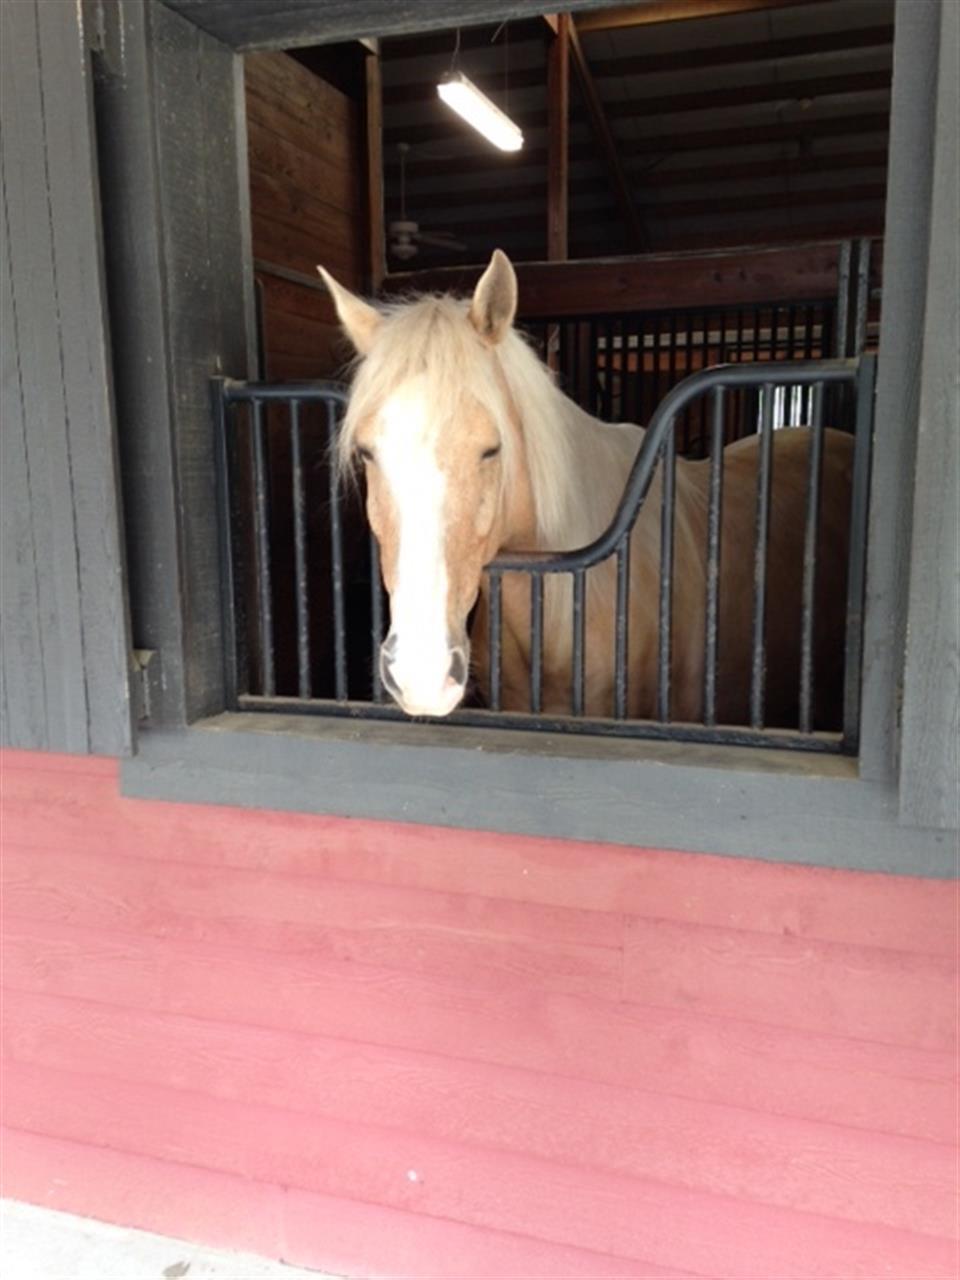 Spring Island, Equestrian Stable, Okatie SC